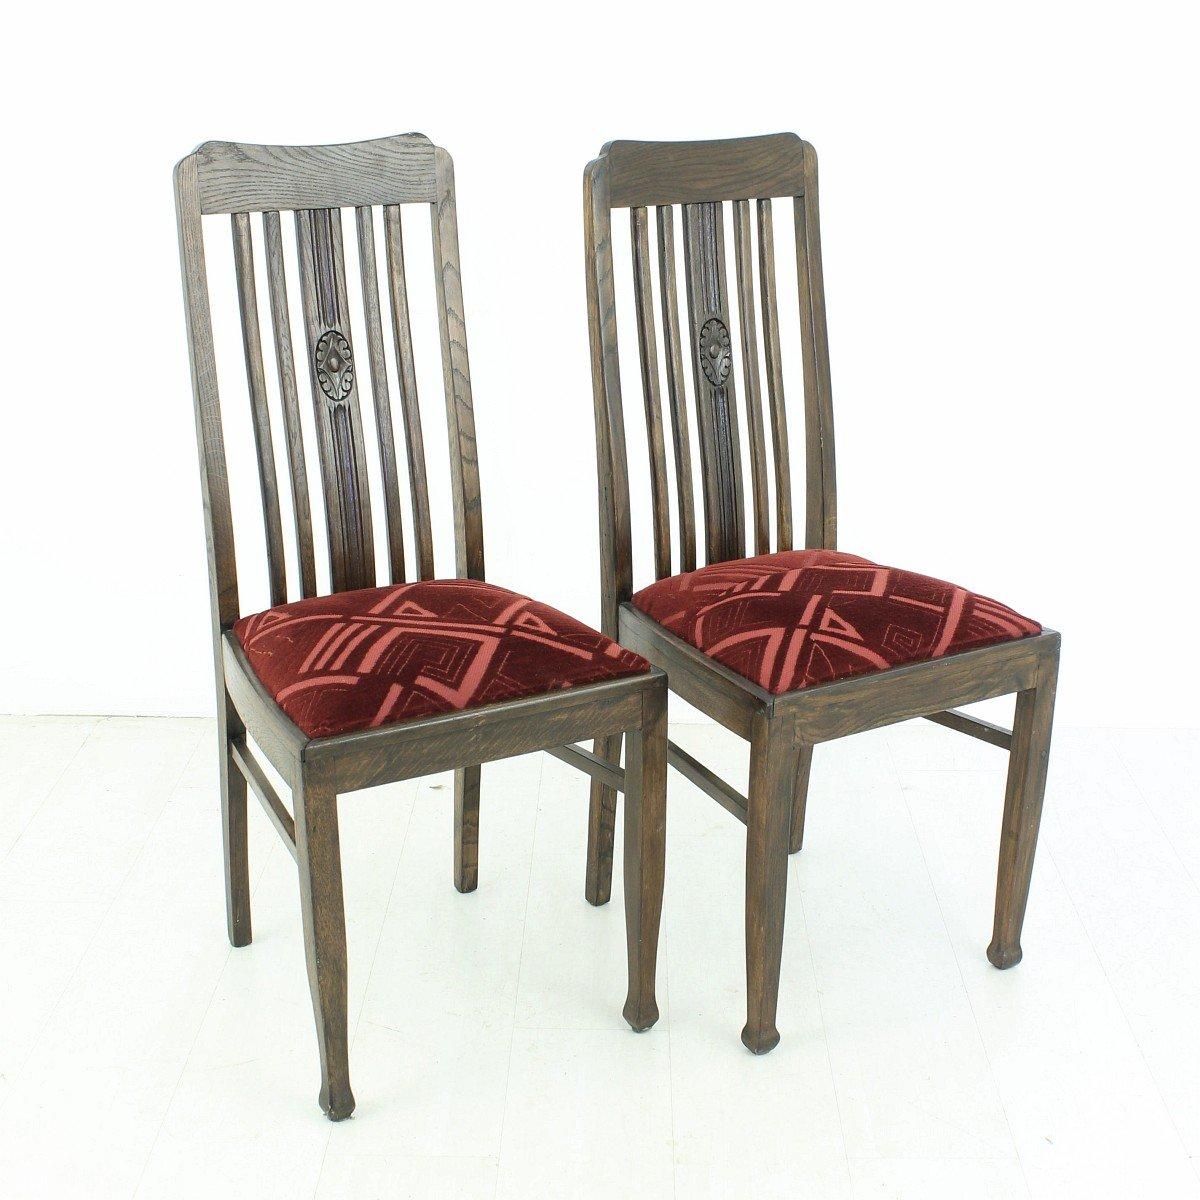 vintage wooden dining chairs hanging papasan chair diy oak 1920s set of 2 for sale at pamono 7 price 310 00 regular 405